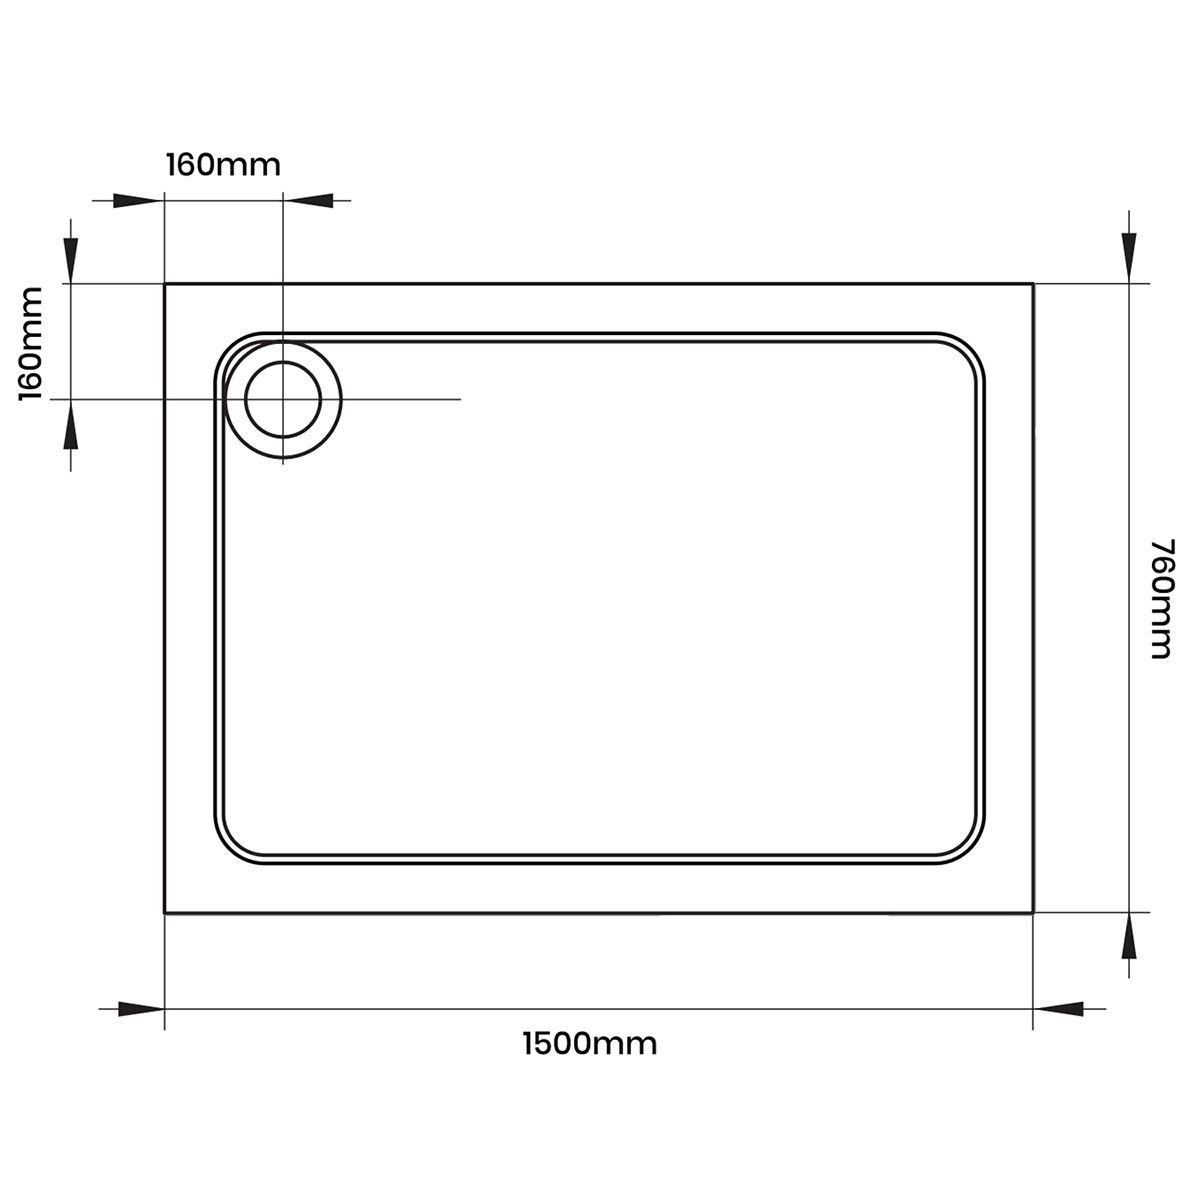 Aquadart Rectangular 1500 x 760 Shower Tray Dimensions